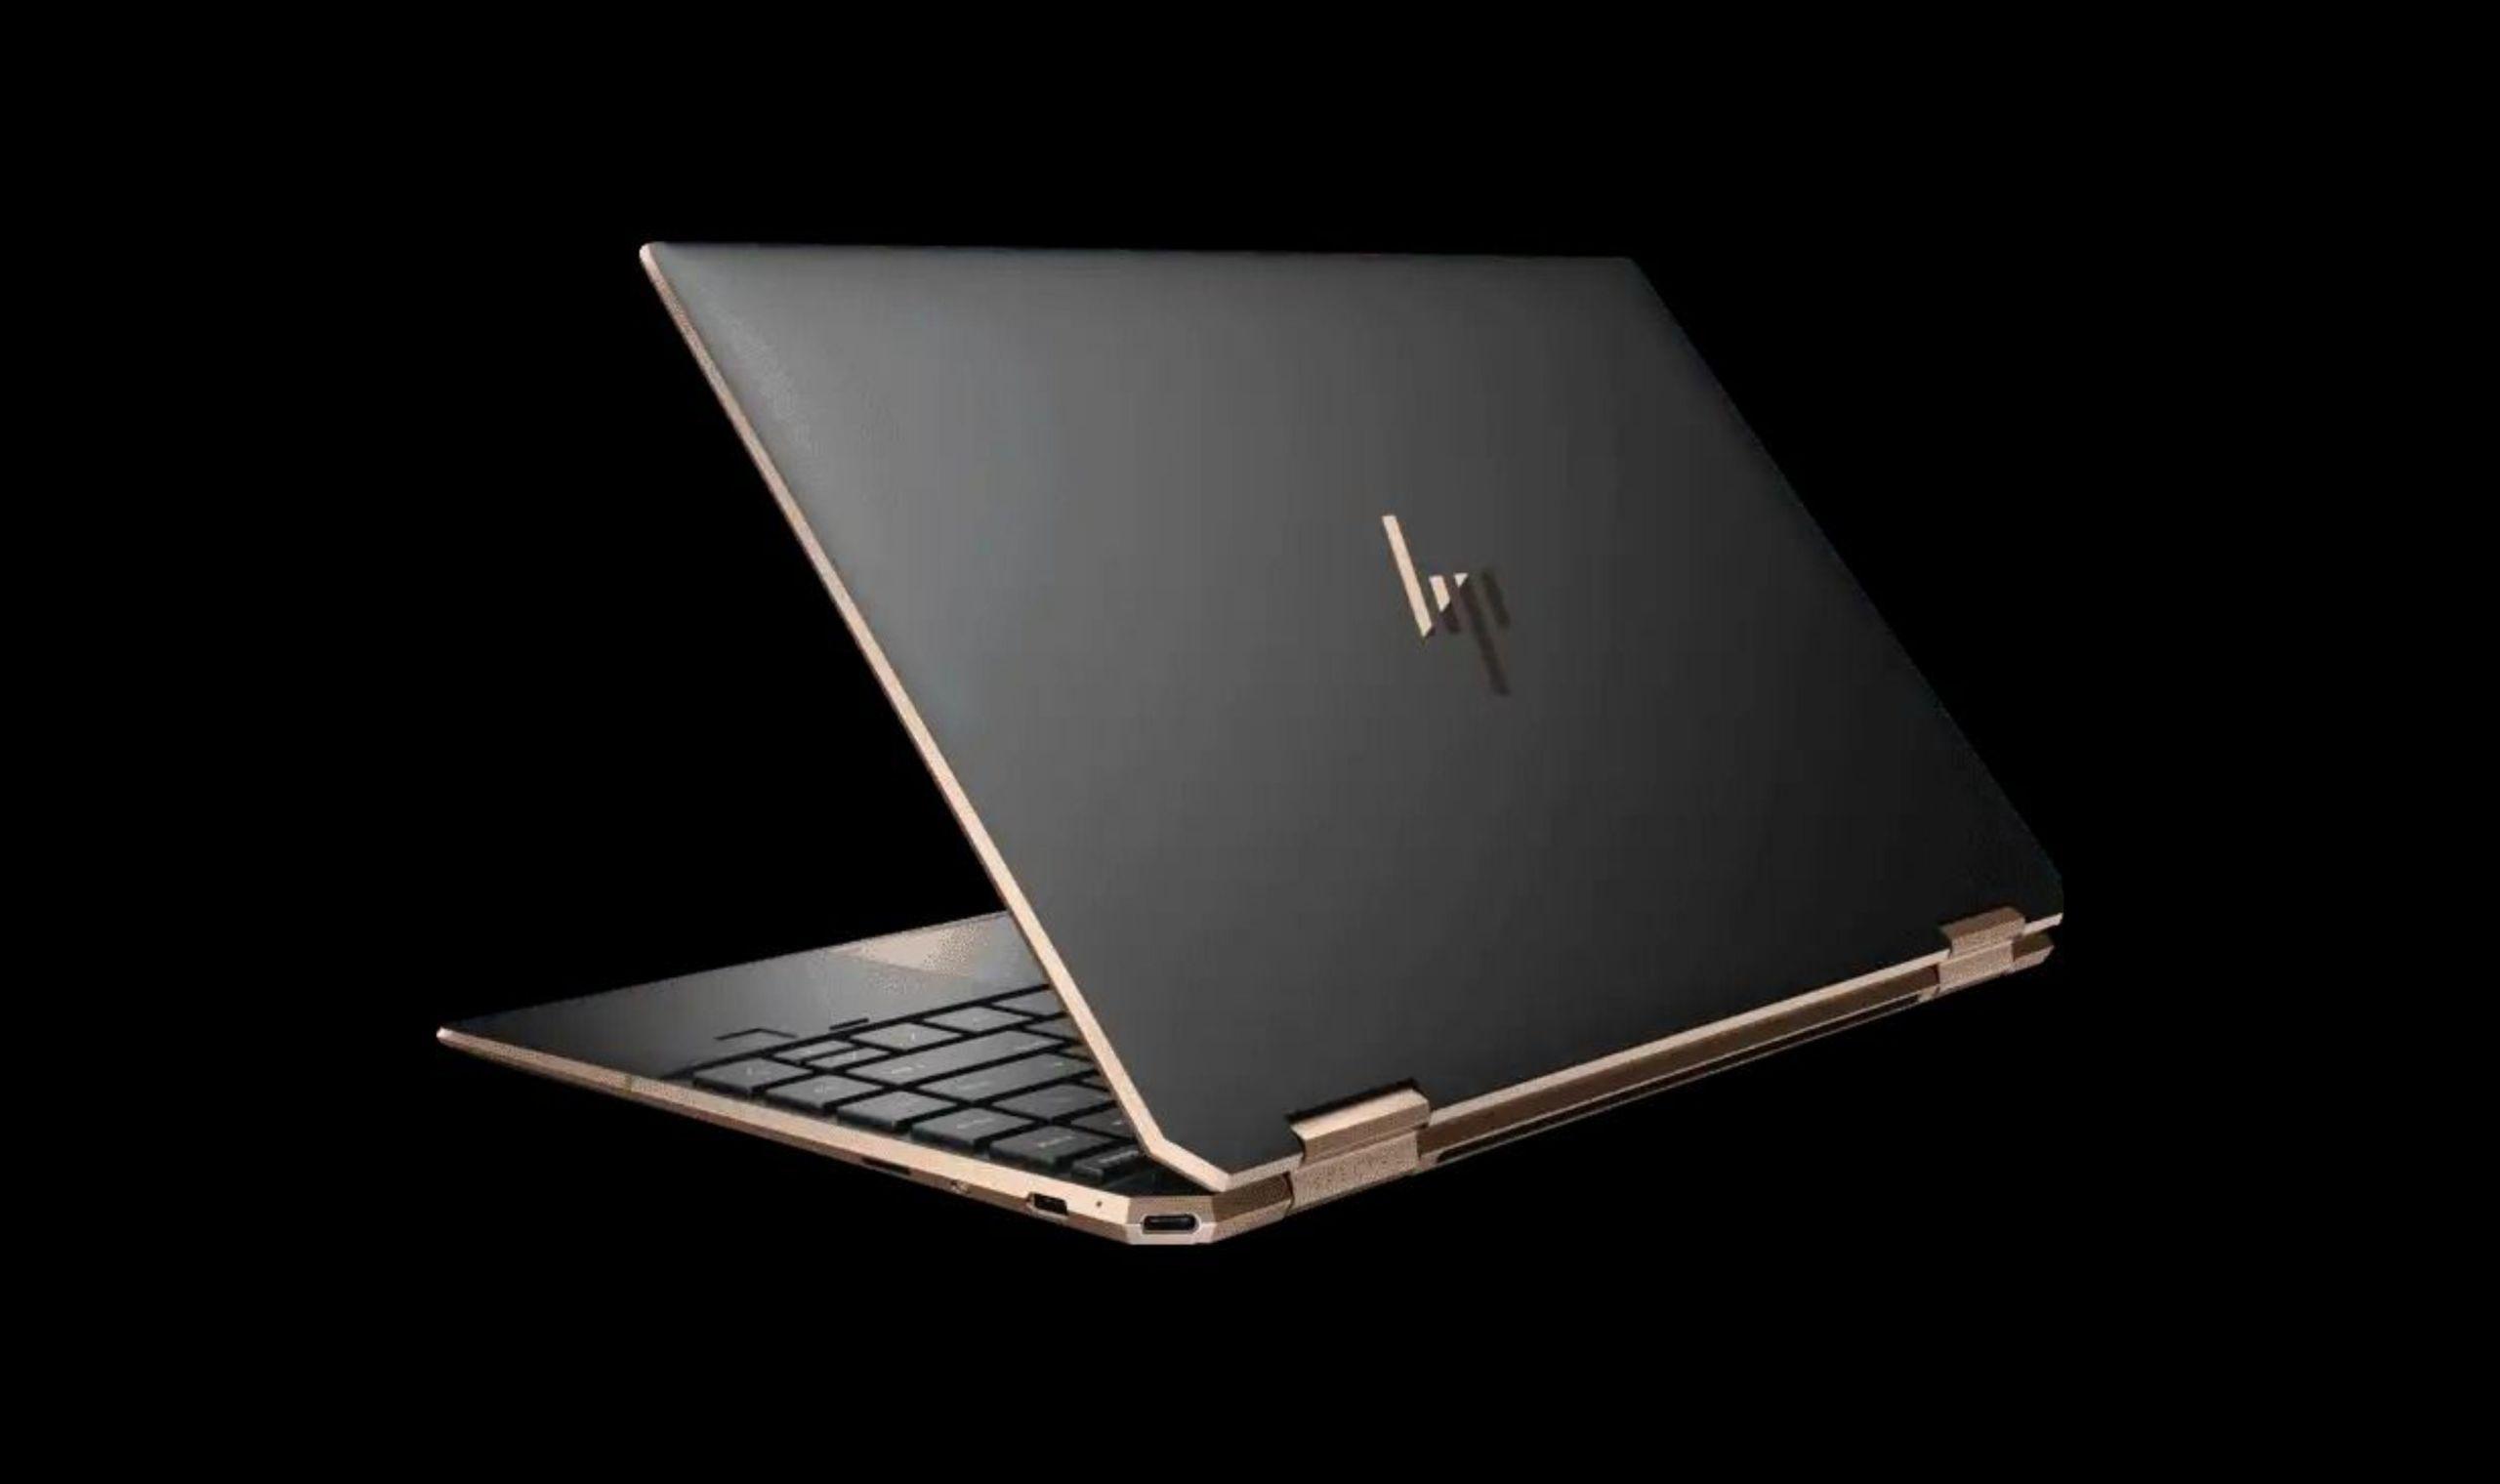 HP стал крупнейшем брендом ноутбуков в прошедшем квартале (HP Spectre x360 13 aw0205tu scaled)